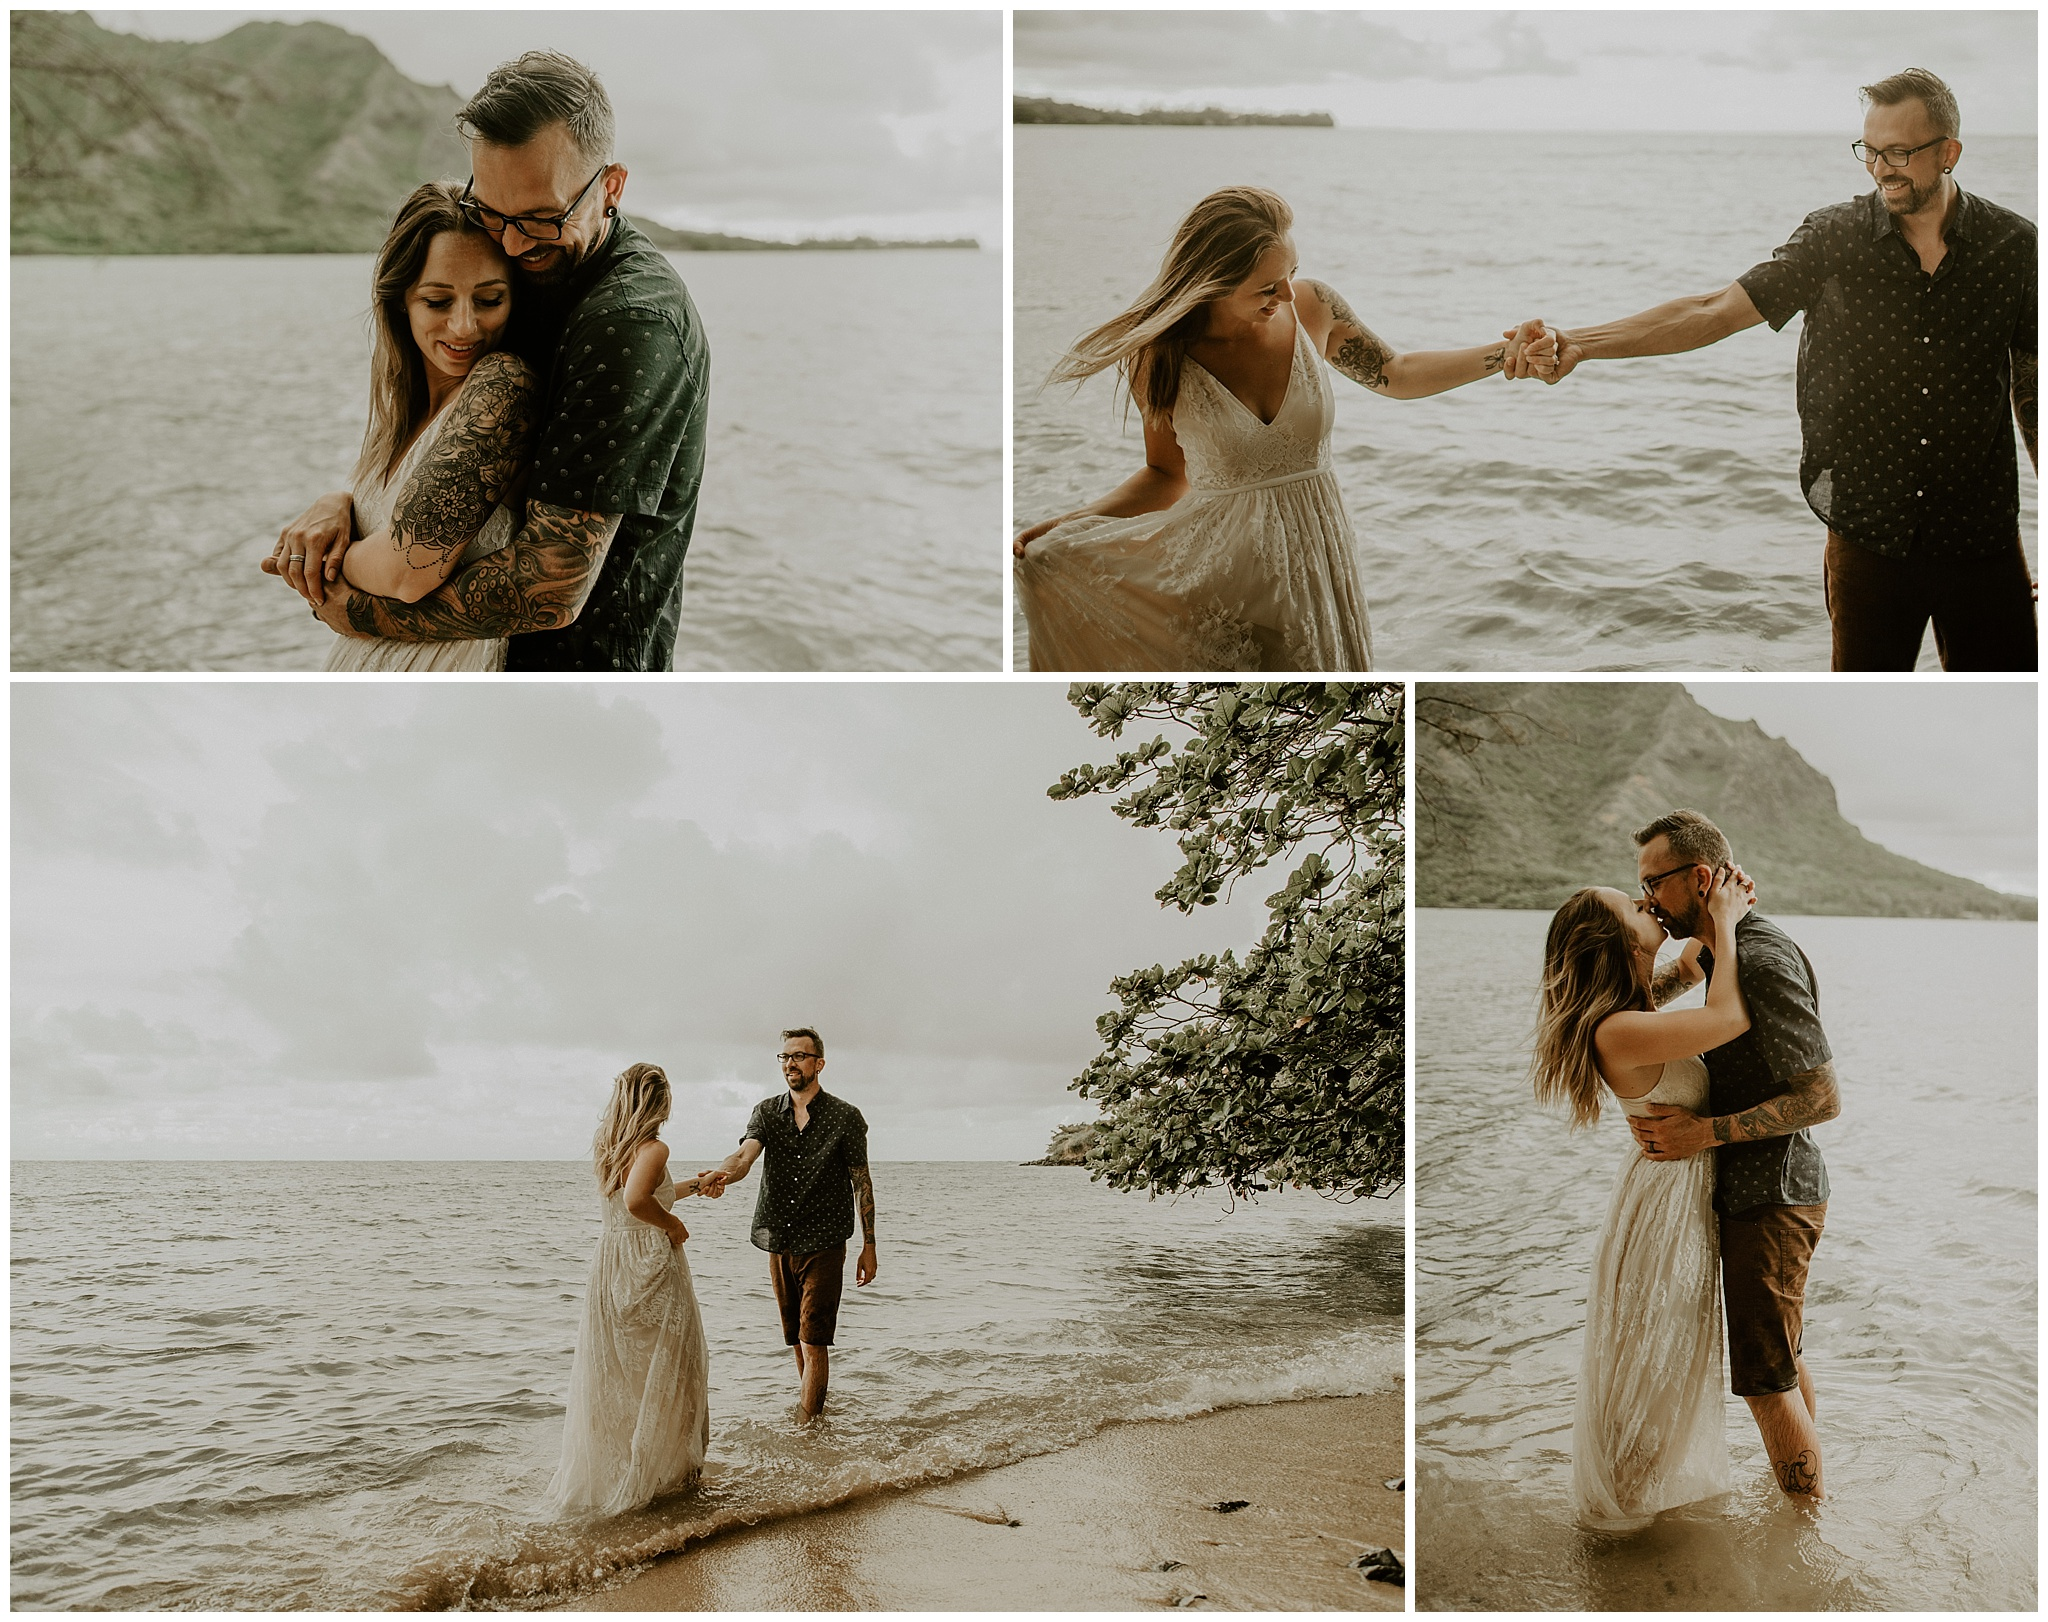 hawaii_couples_photographer8.jpg